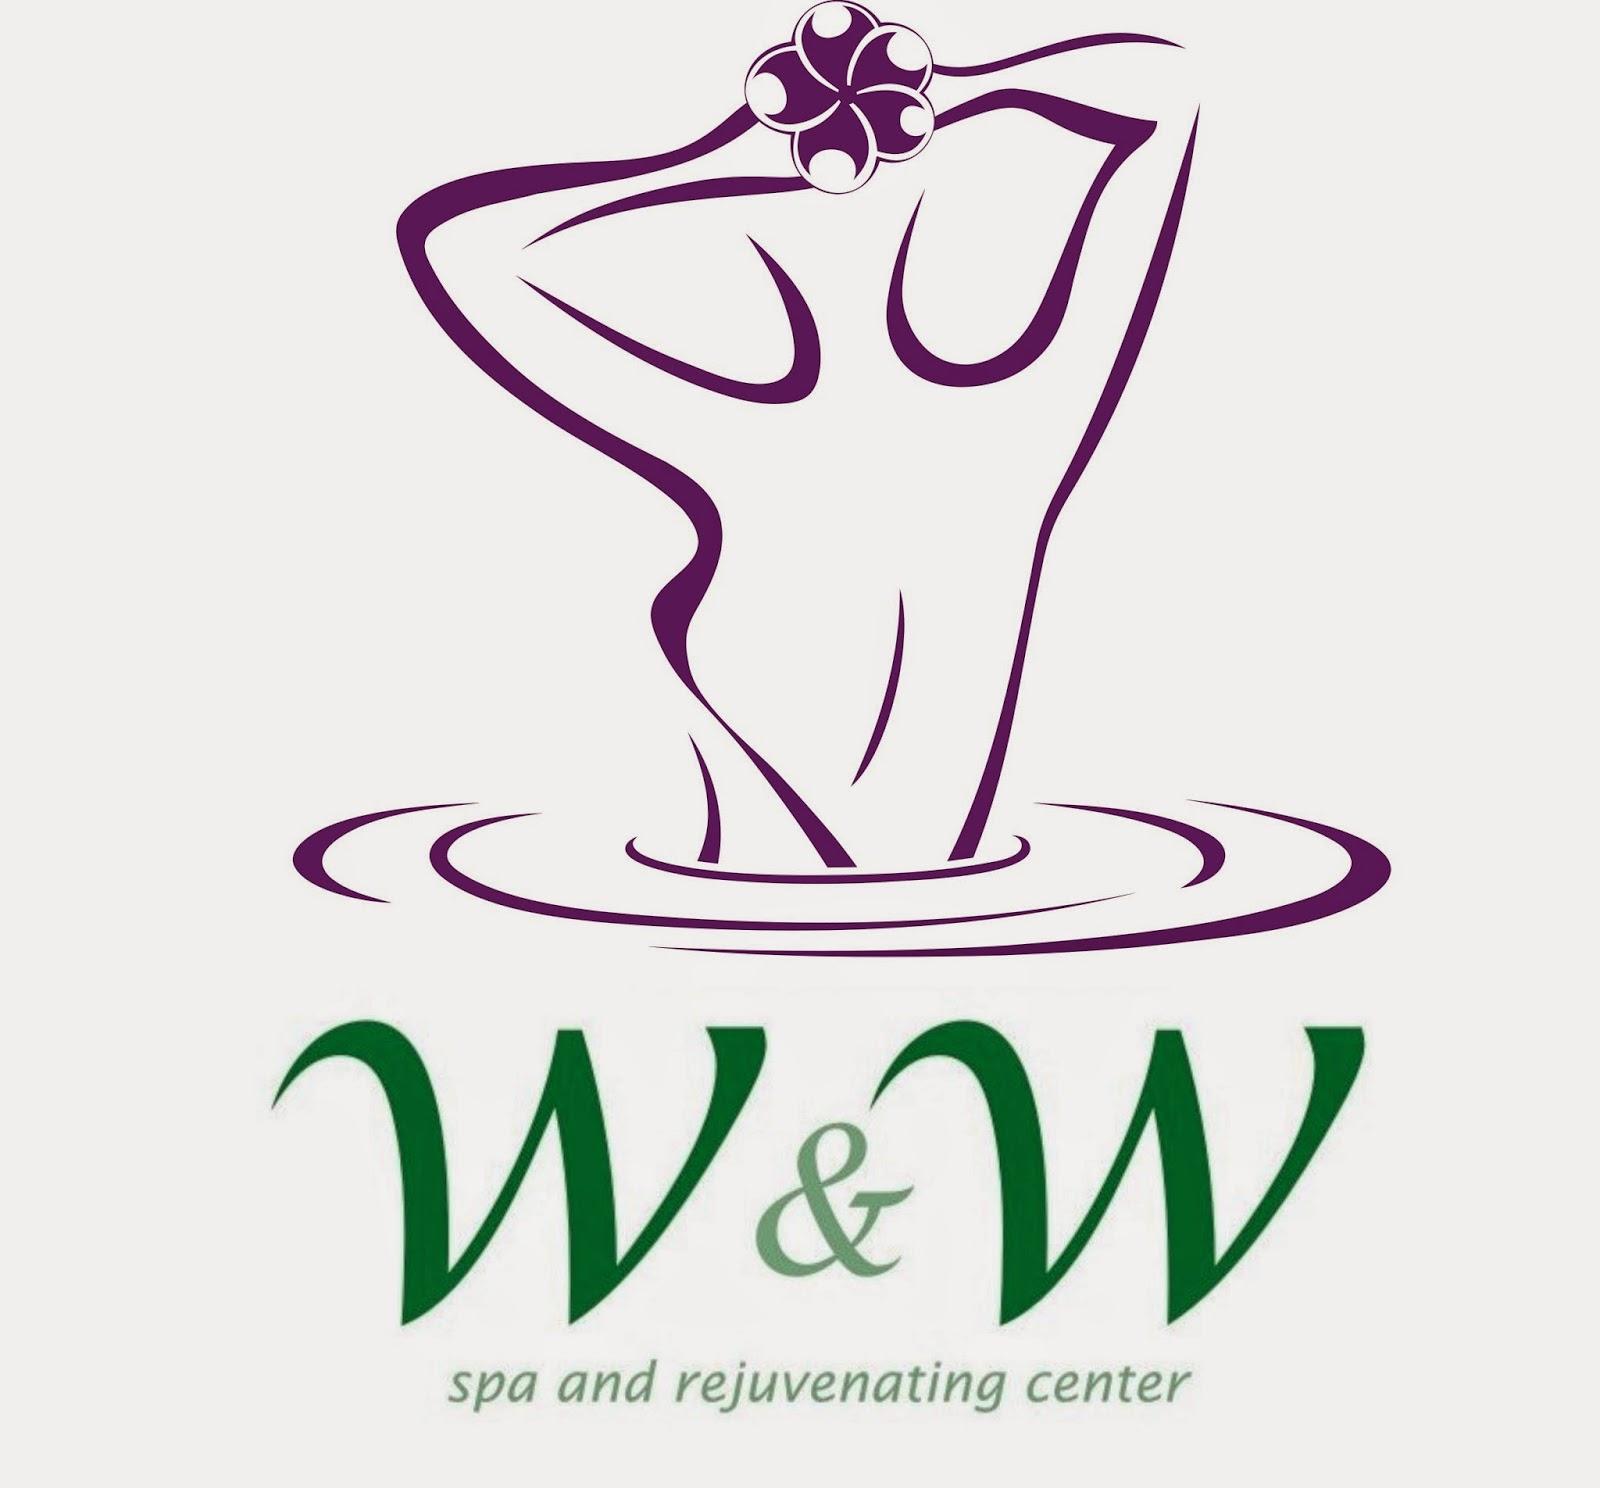 Lowongan Kerja Marketing Manager di WW Spa Yogyakarta